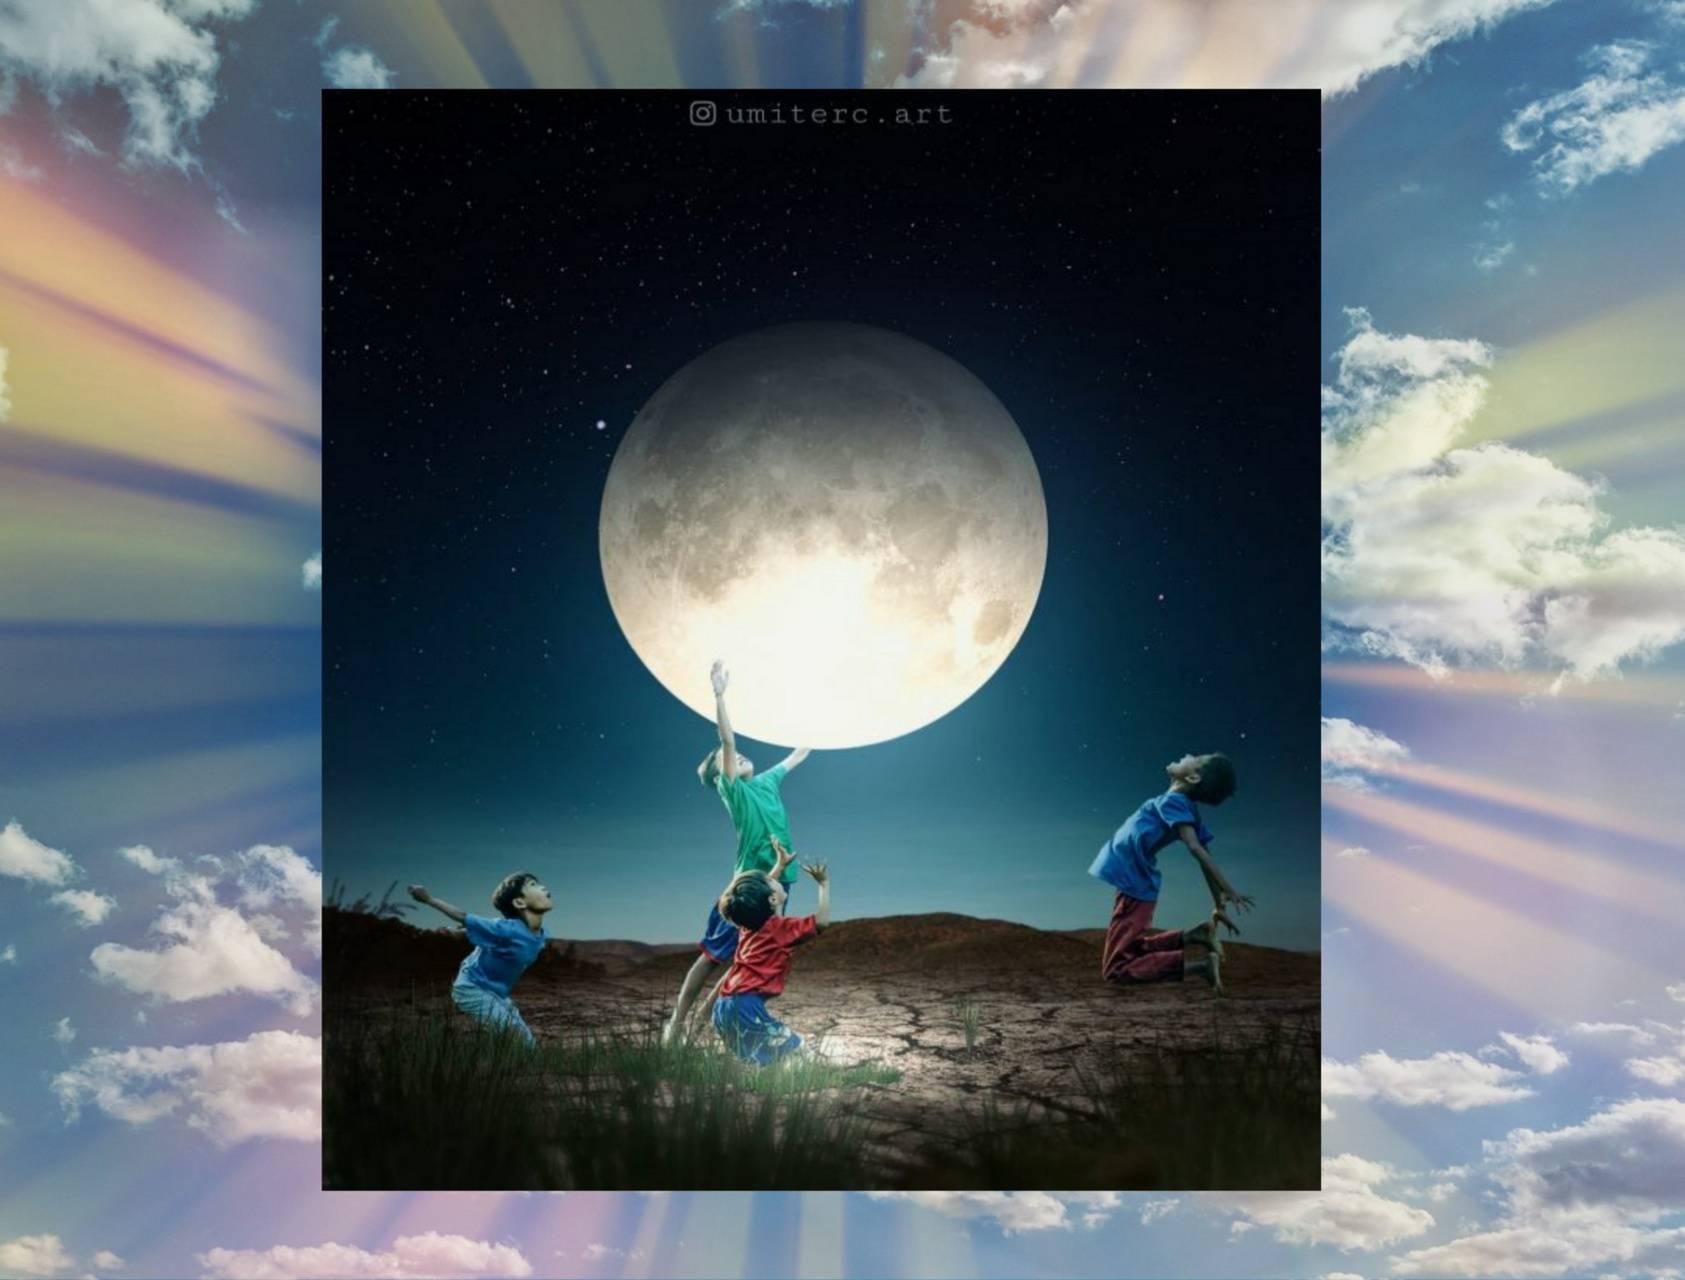 Frolic in the moon